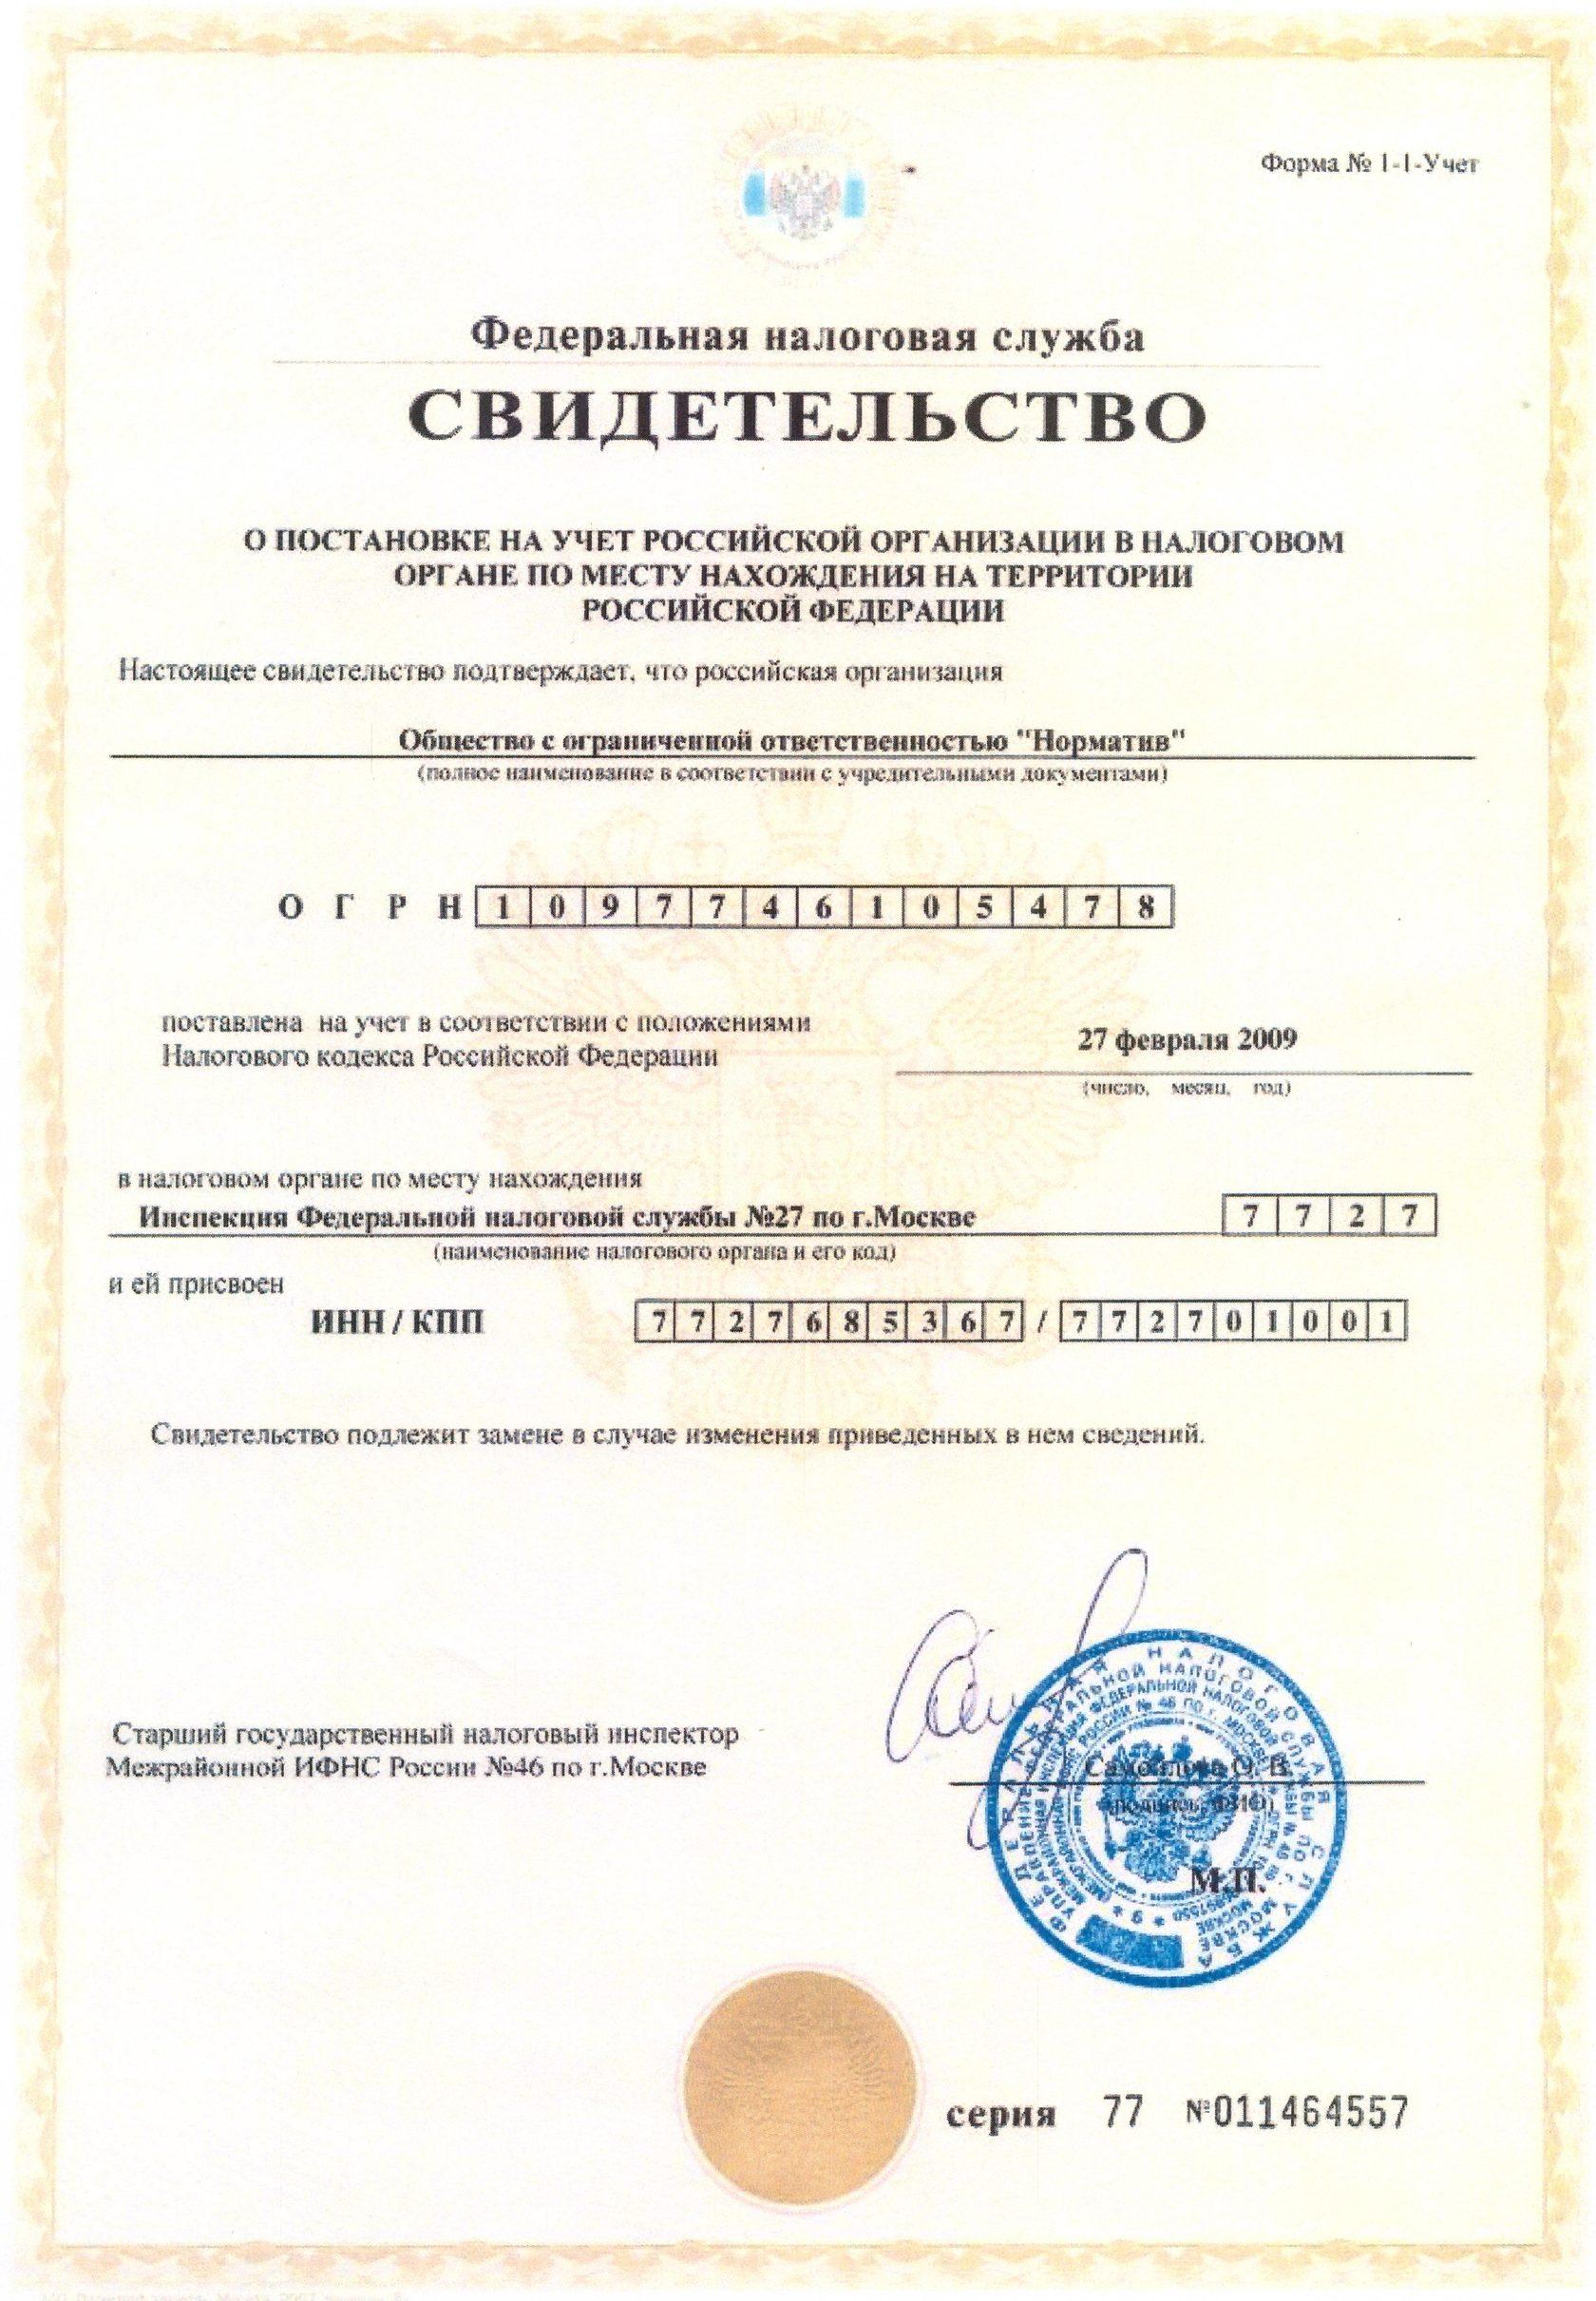 kadastr99.ru